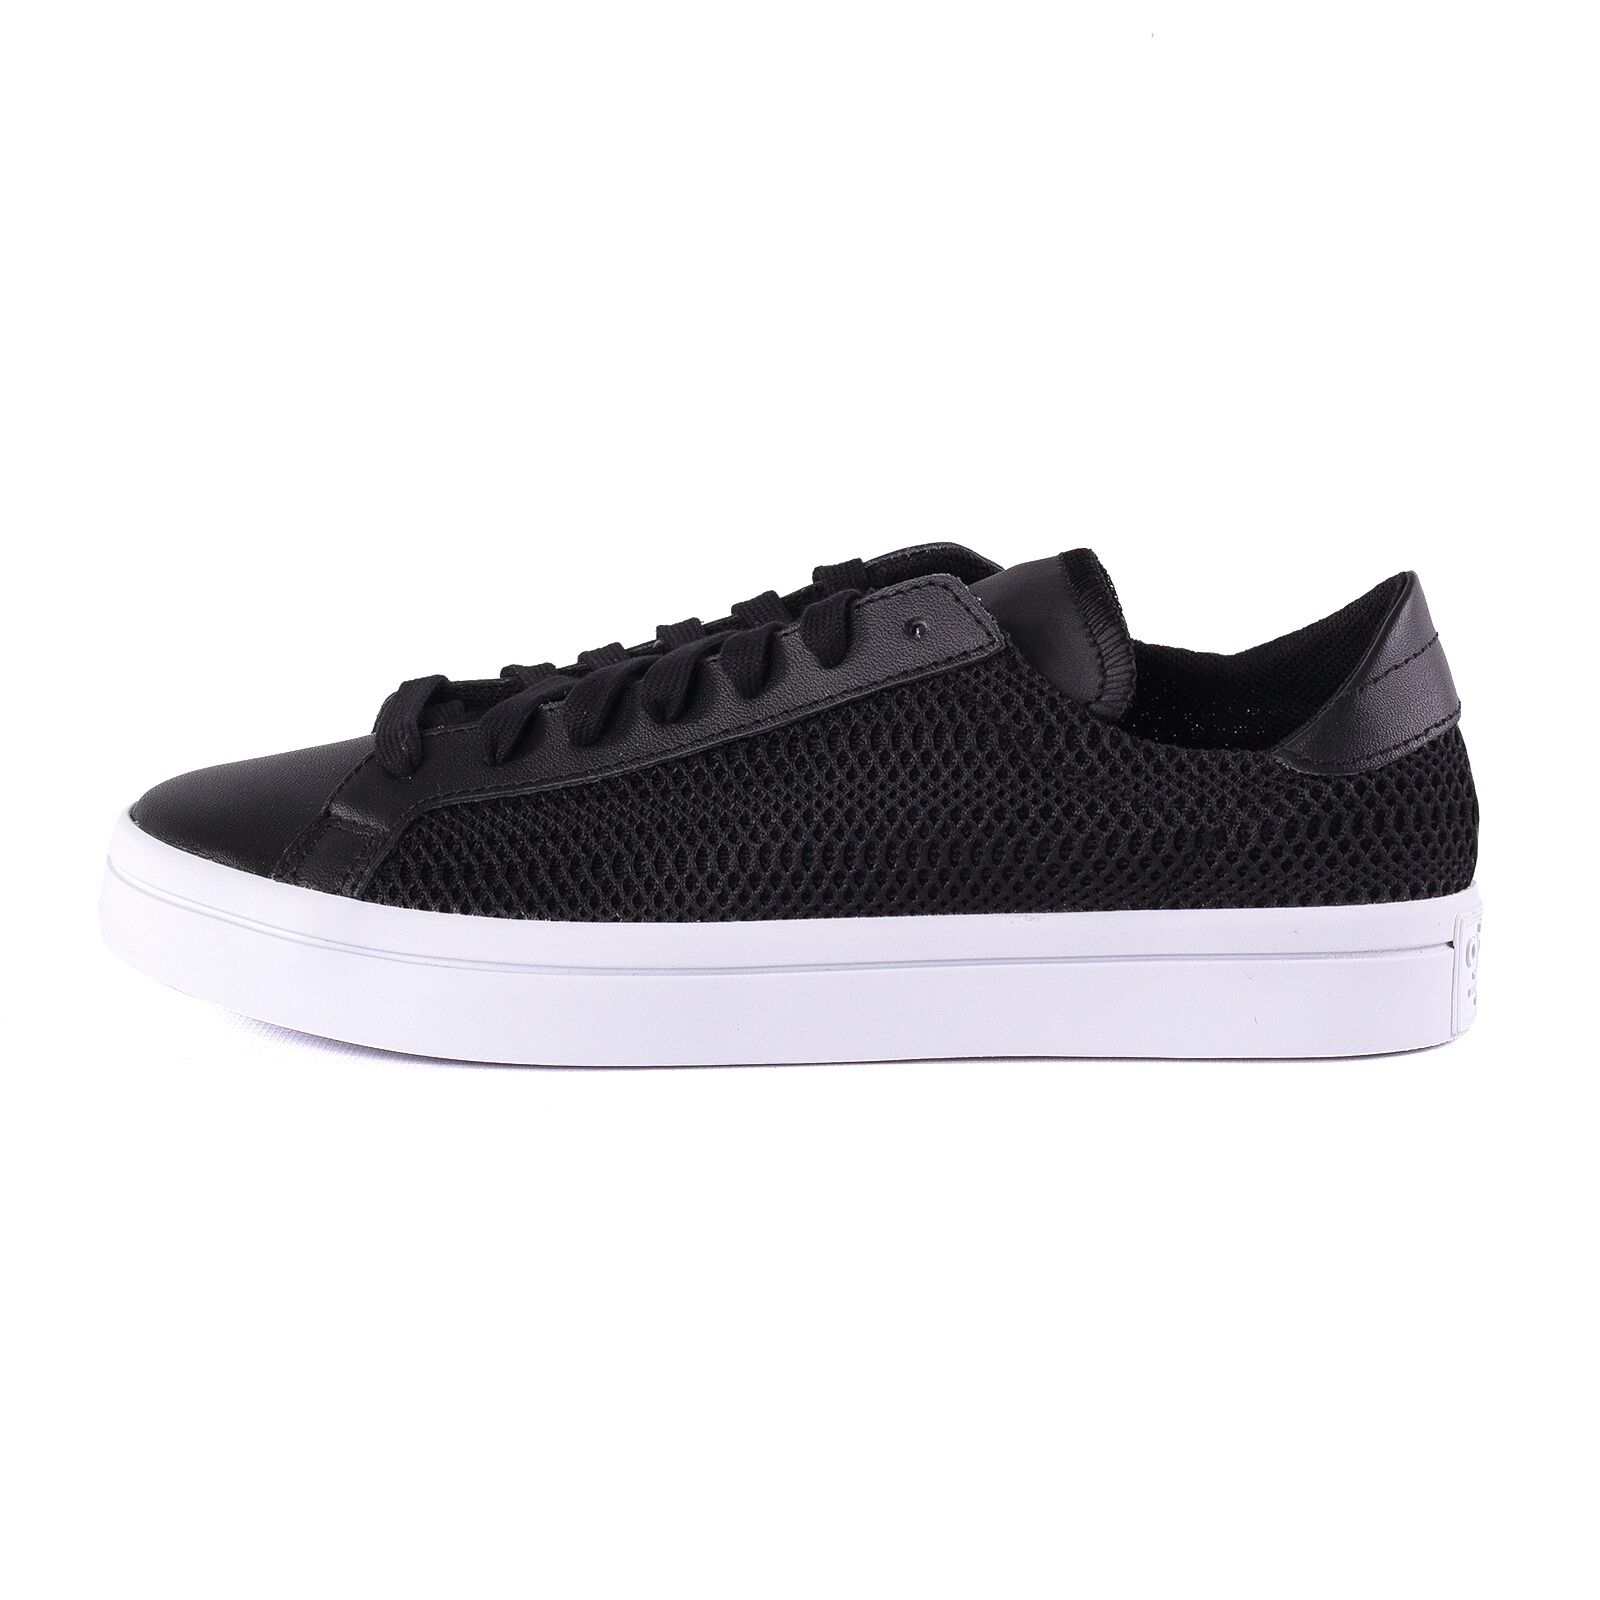 Adidas Court cortos, Vantage señora zapato cortos, Court color negro/negro/ blanco o, 51062 5f321e